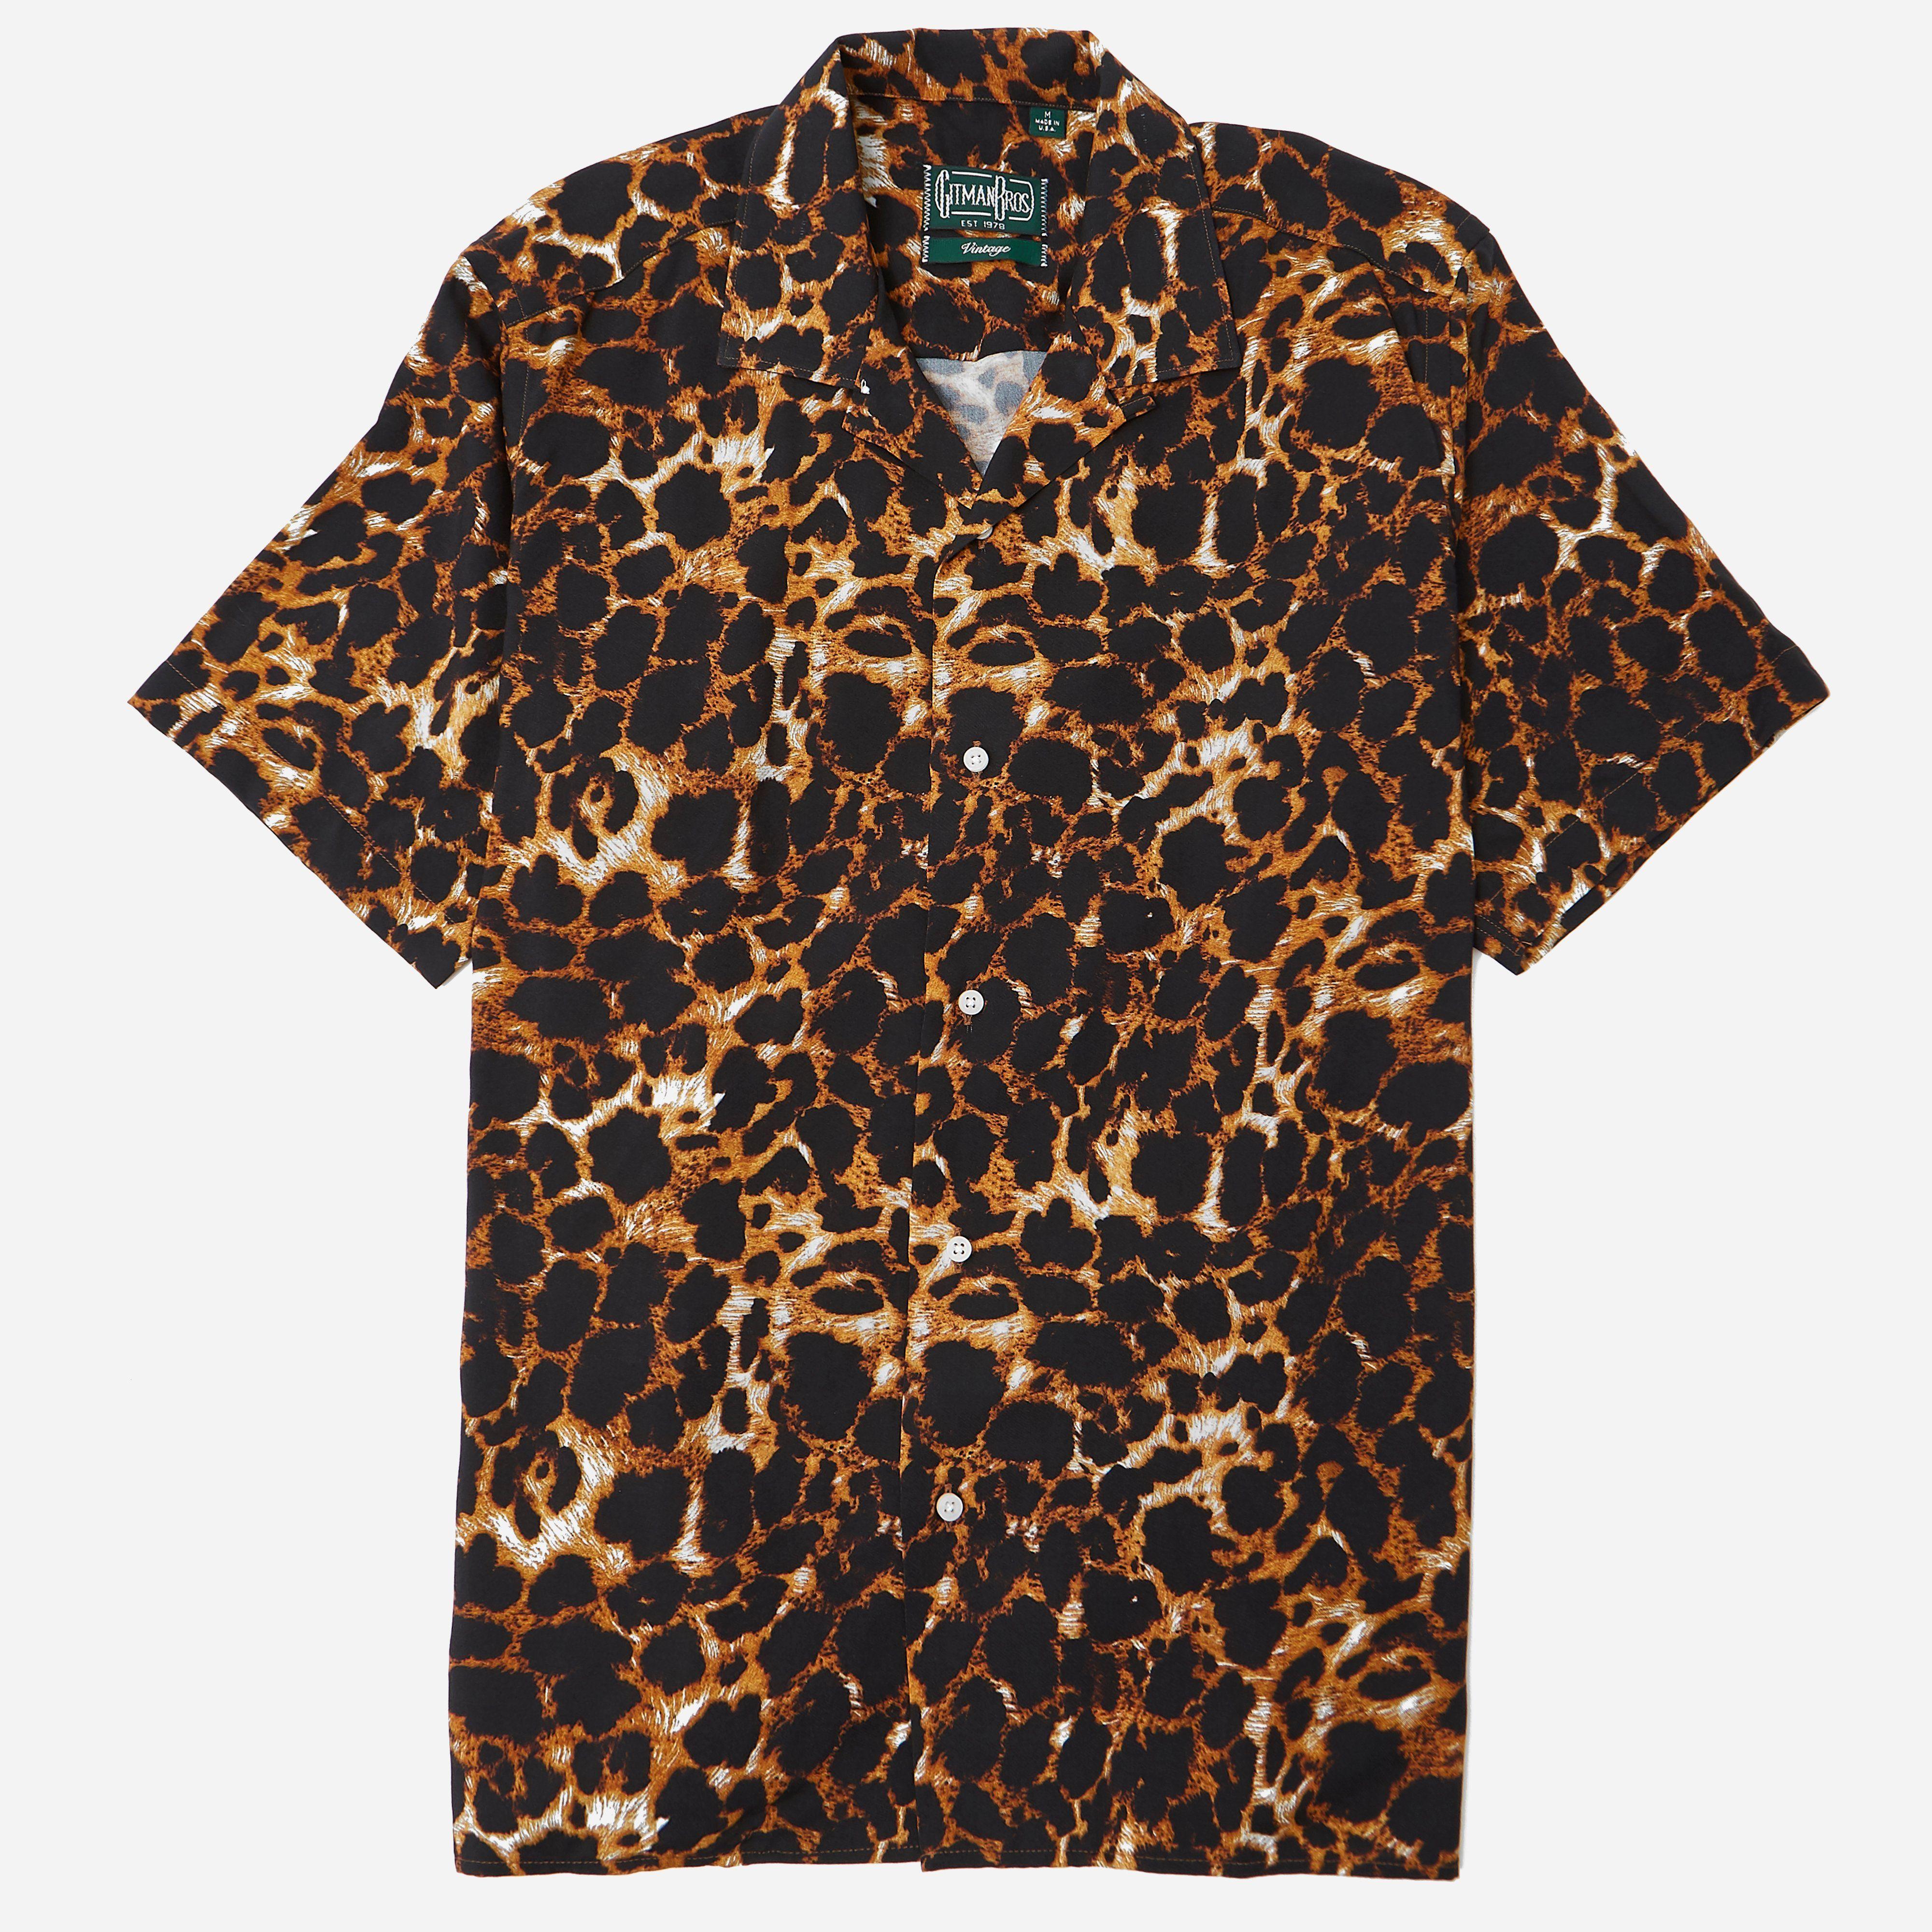 Gitman Vintage Rayon Leopard Camp Shirt